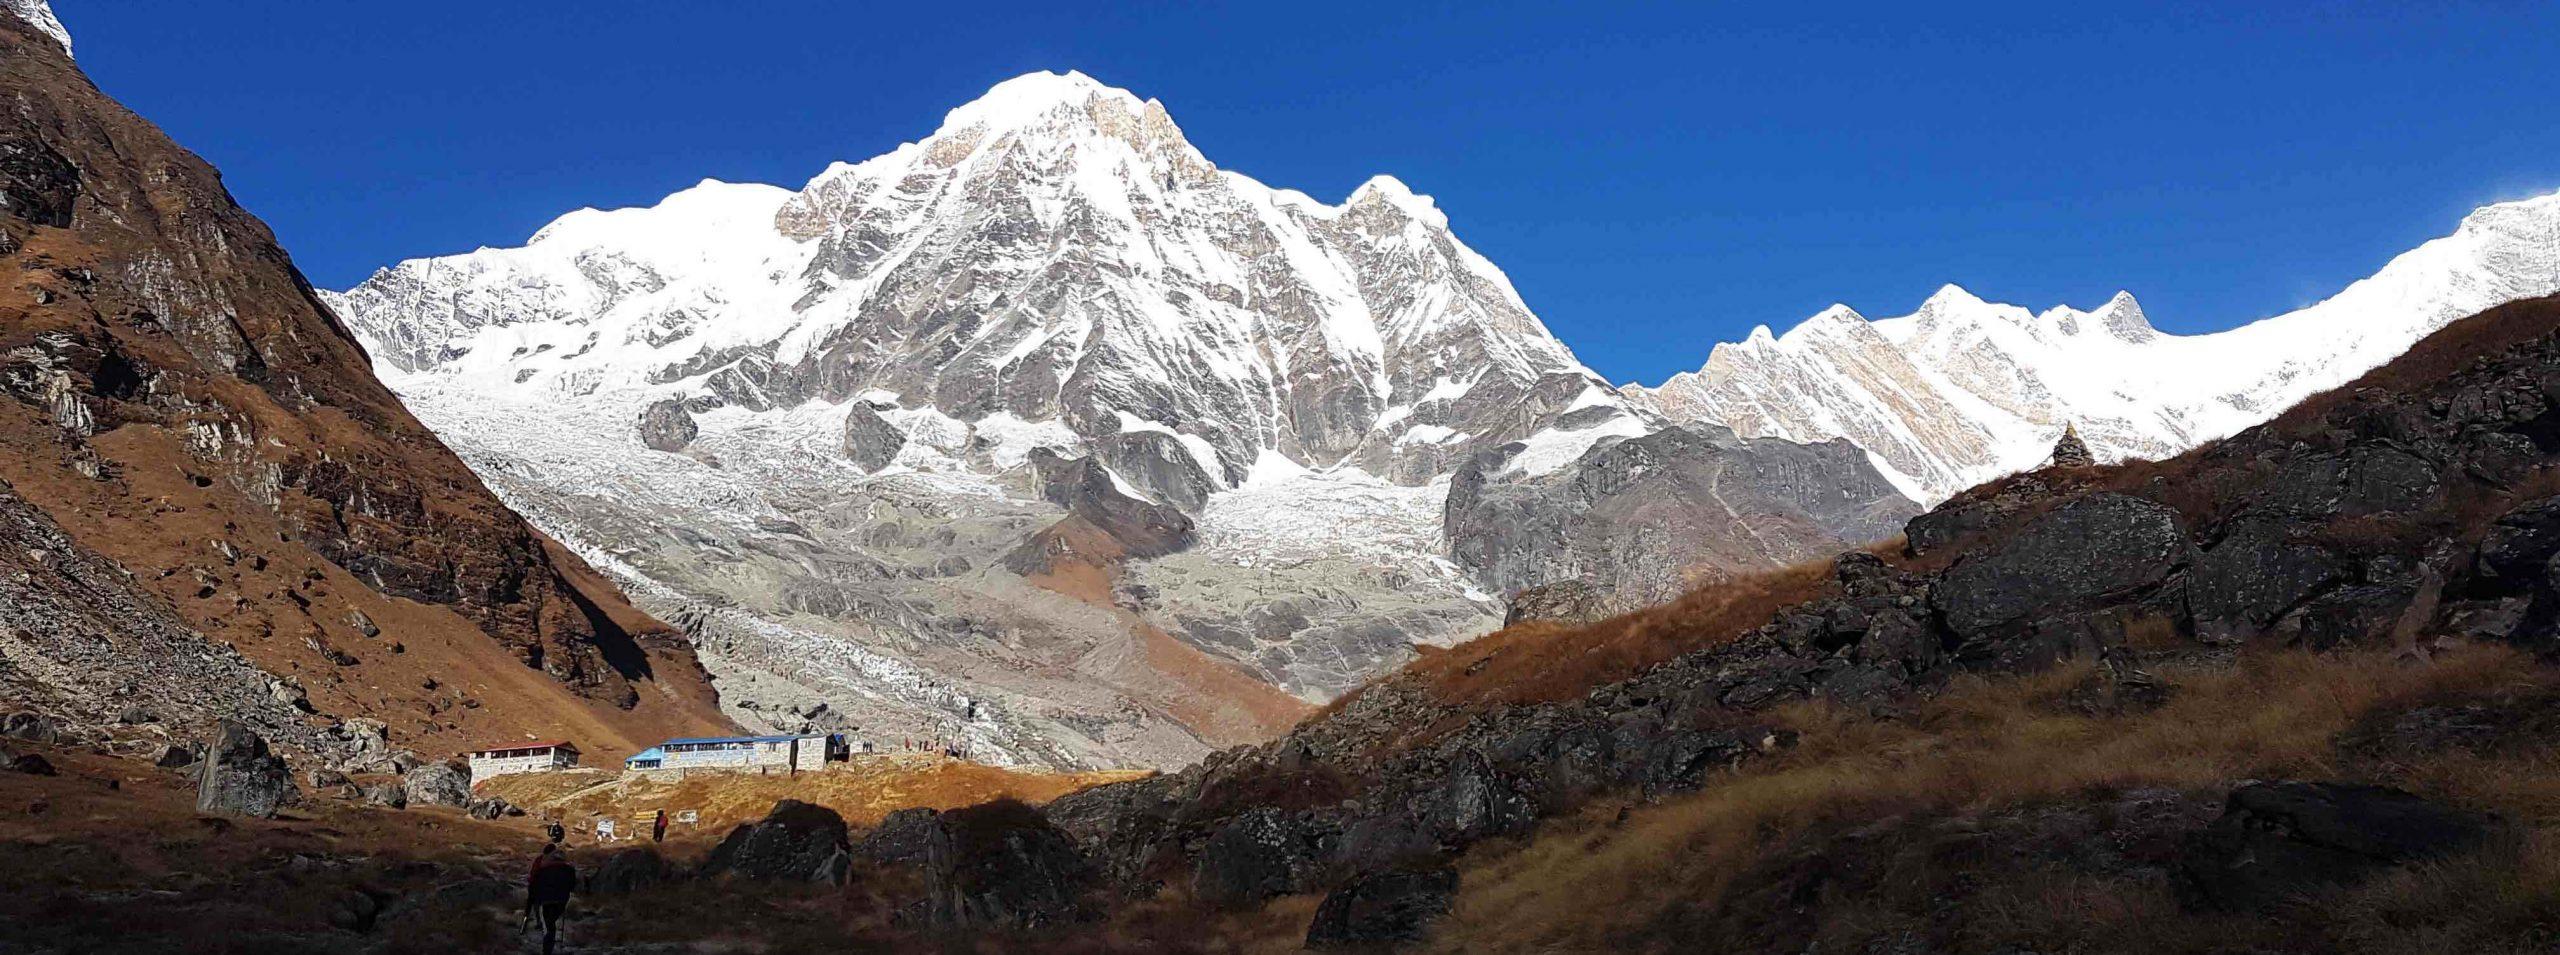 header image Annapurna sunrise